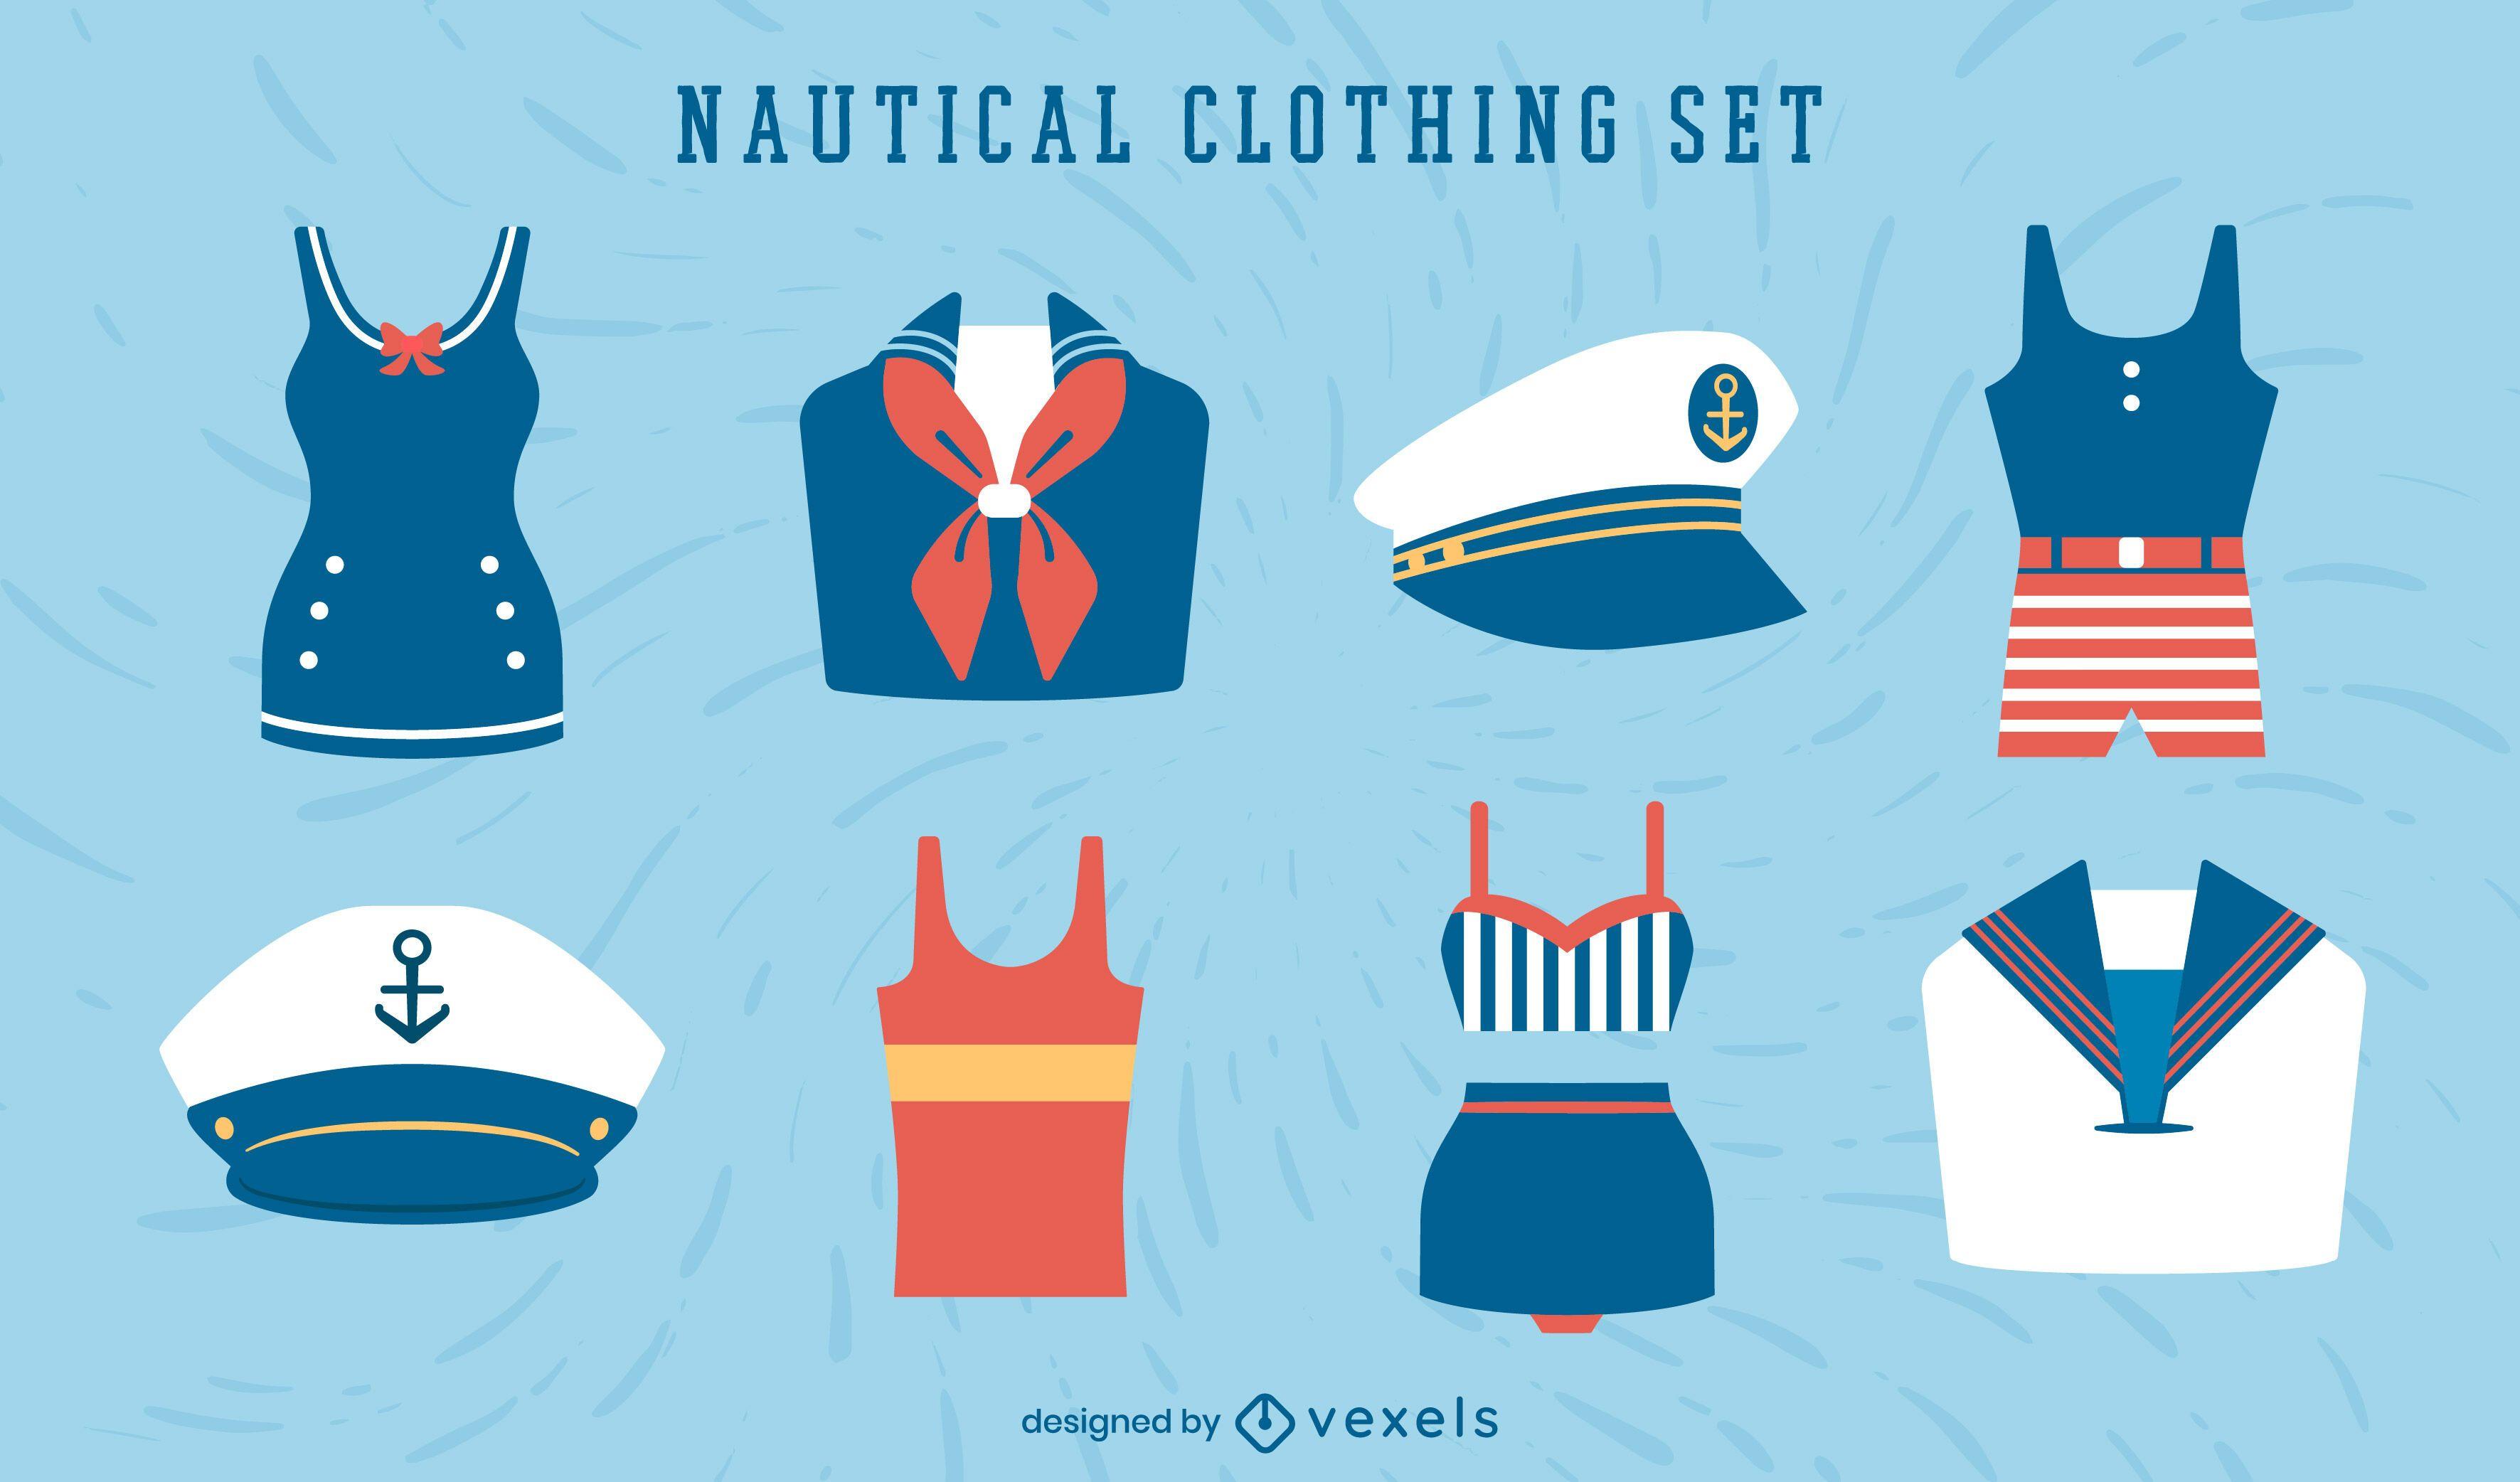 Conjunto de roupas náuticas vintage de marinheiro